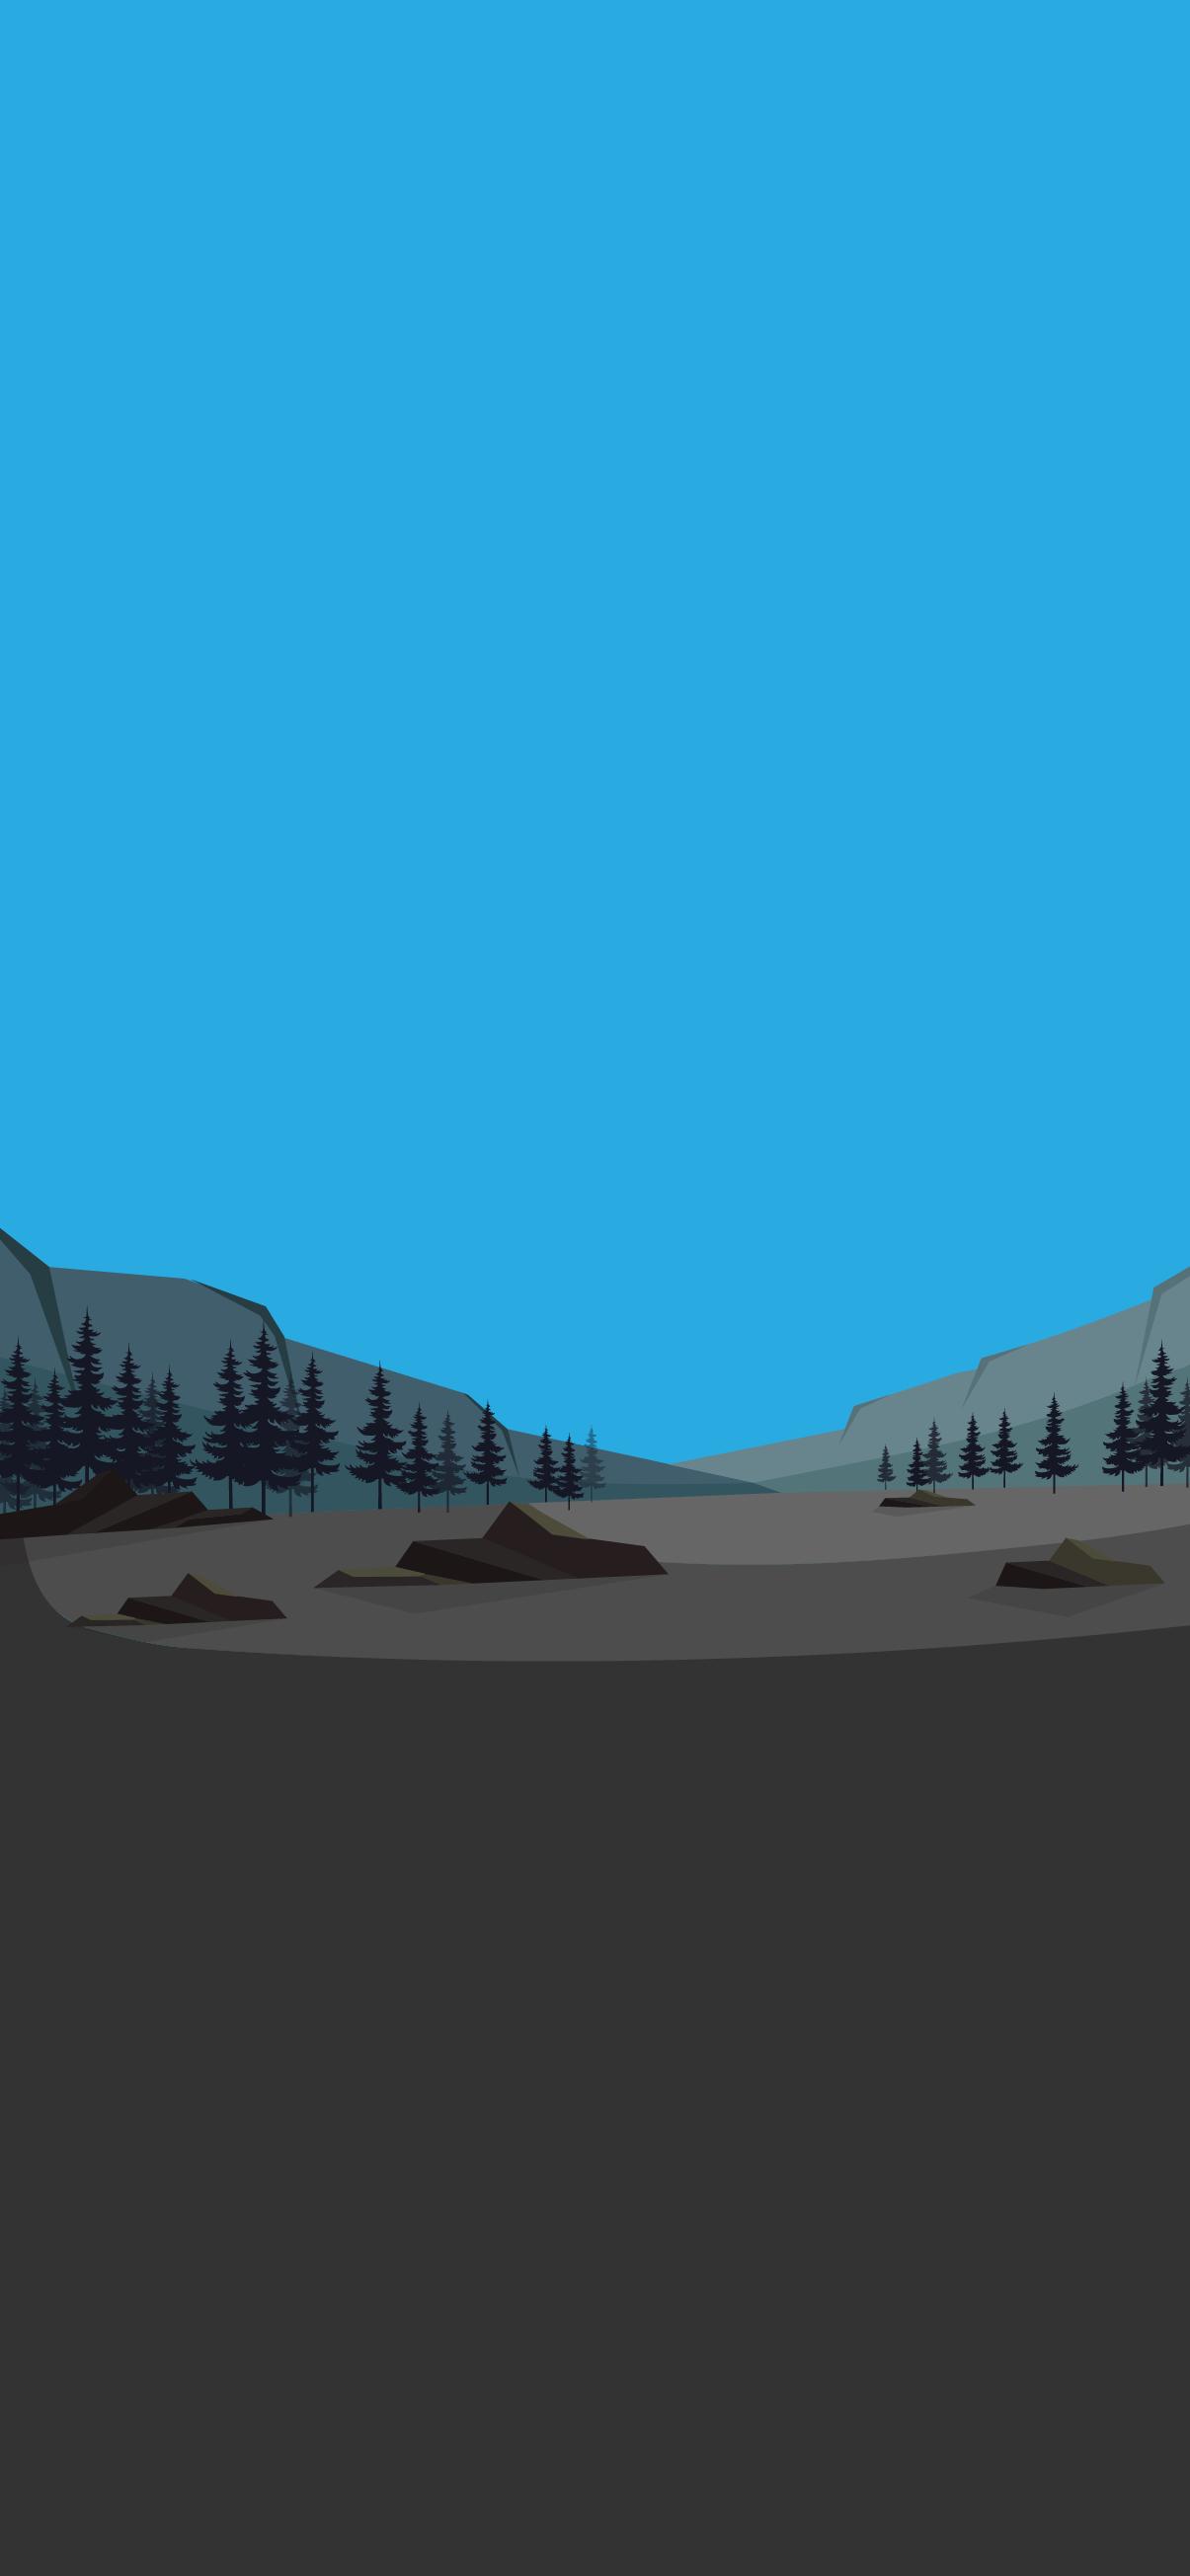 minimalist landscape wallpaper iphone